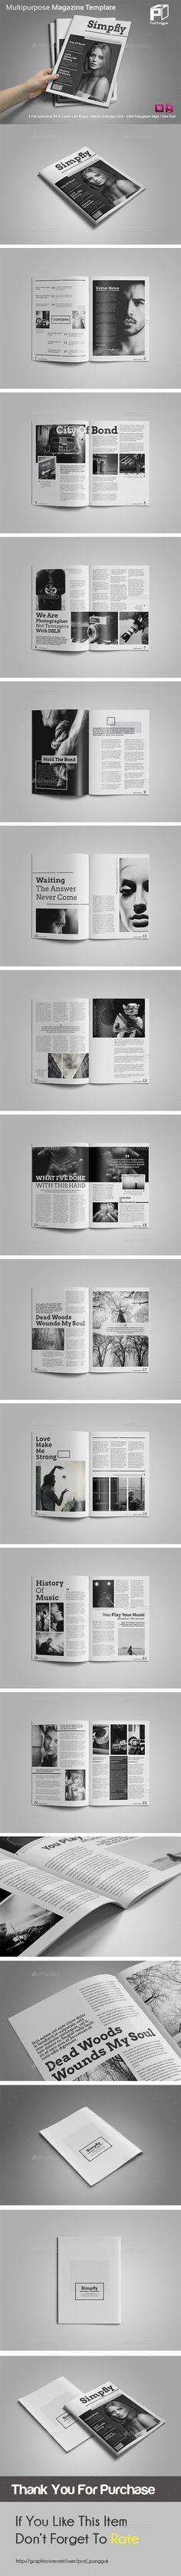 Black & White Magazine Template #design Download: http://graphicriver.net/item/black-white-magazine/11772881?ref=ksioks